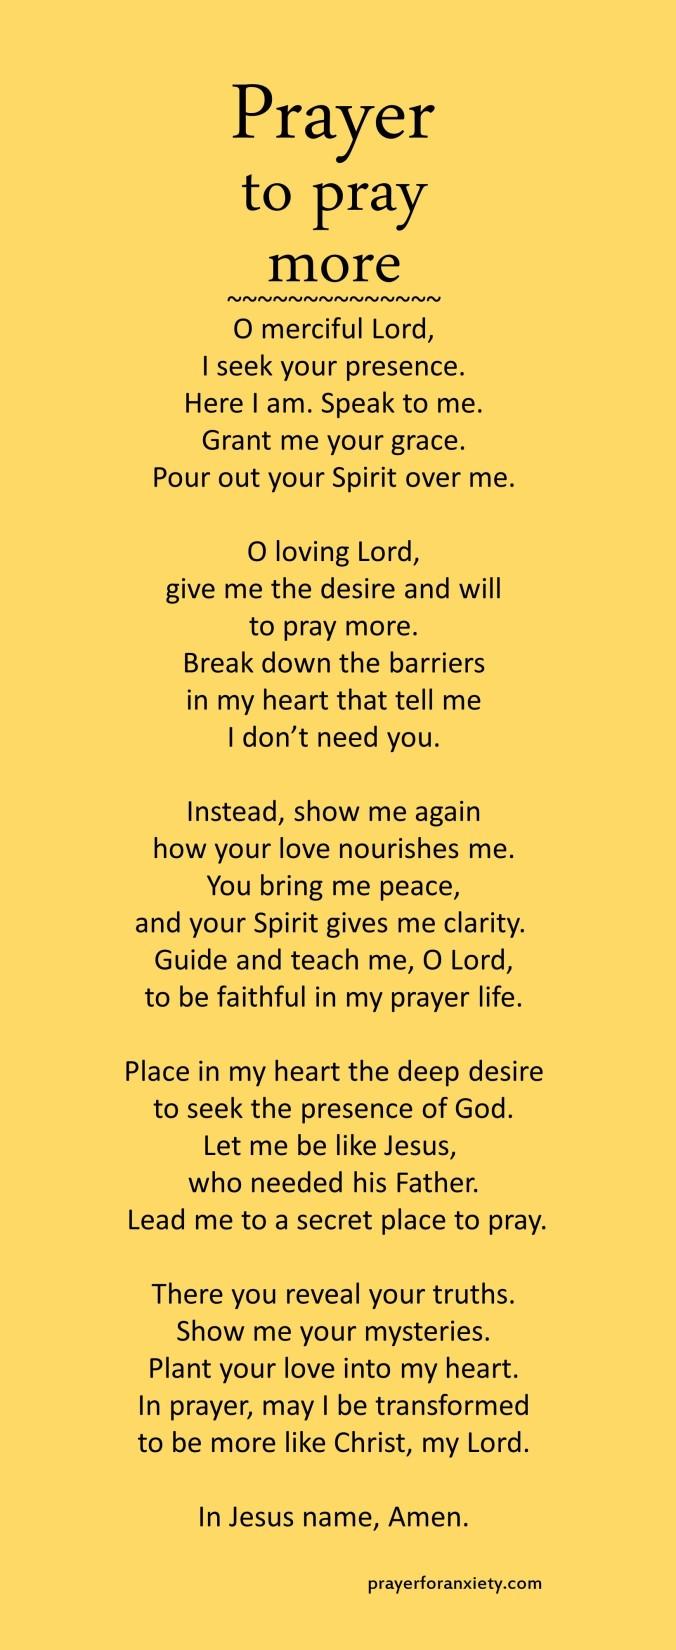 Prayer to pray more